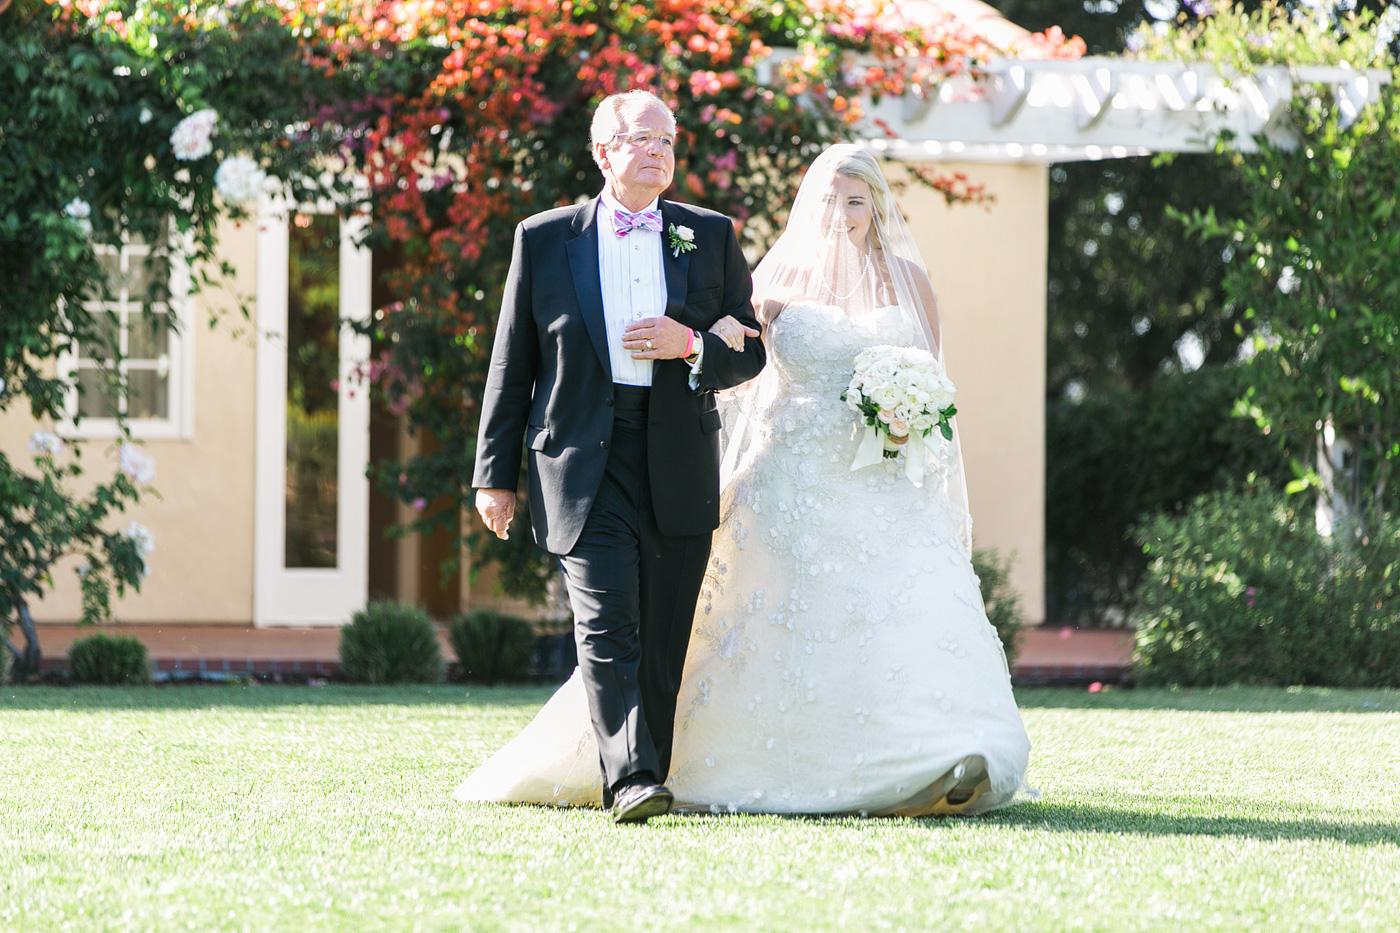 Inn-Rancho-Santa-Fe-Wedding-12